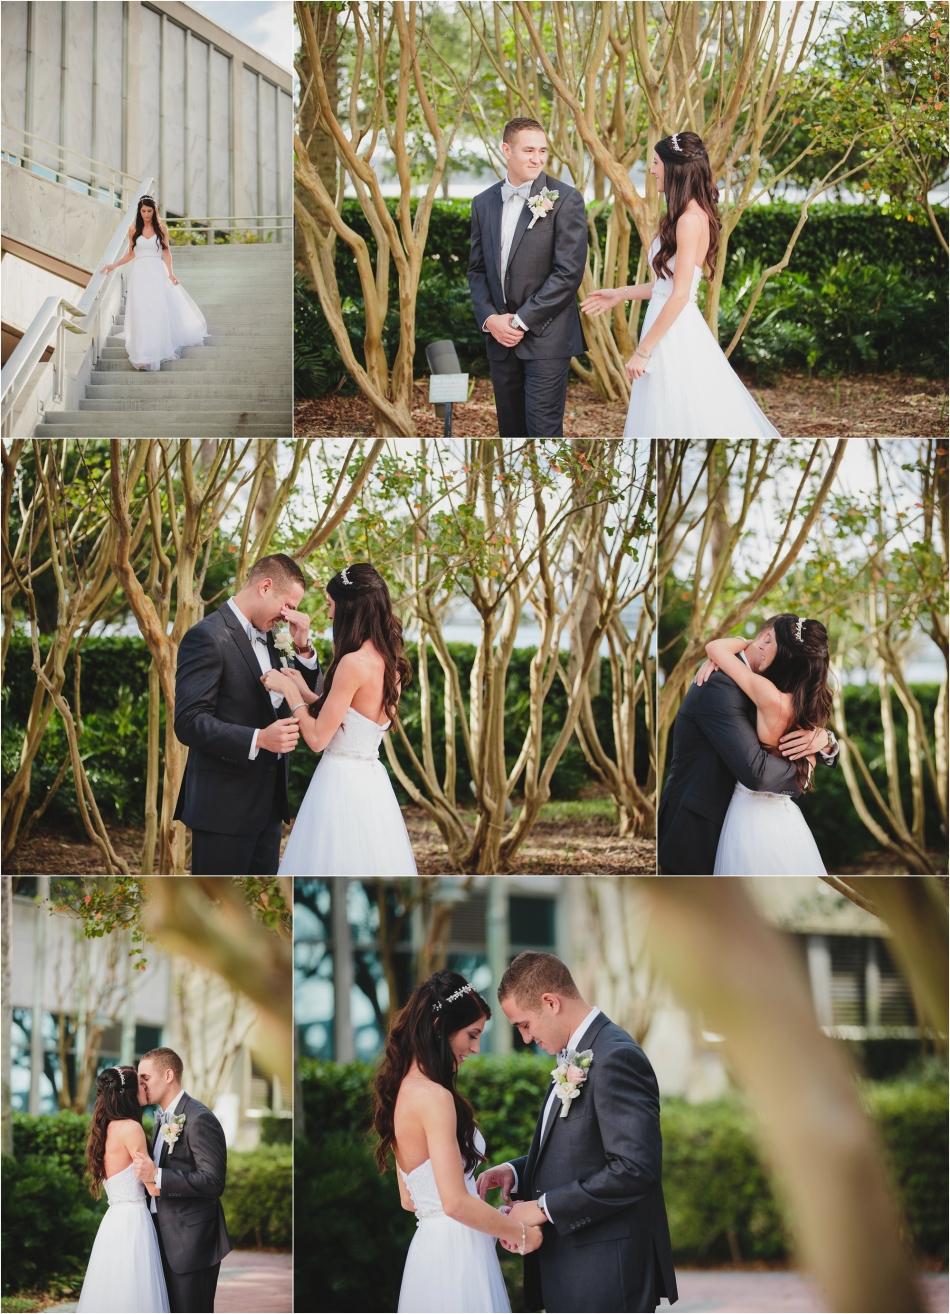 Downtown Jacksonville Fl >> Aetna Riverfront Wedding | Downtown Jacksonville, FL | Kristin + Kyle » Stephanie W Photography Blog